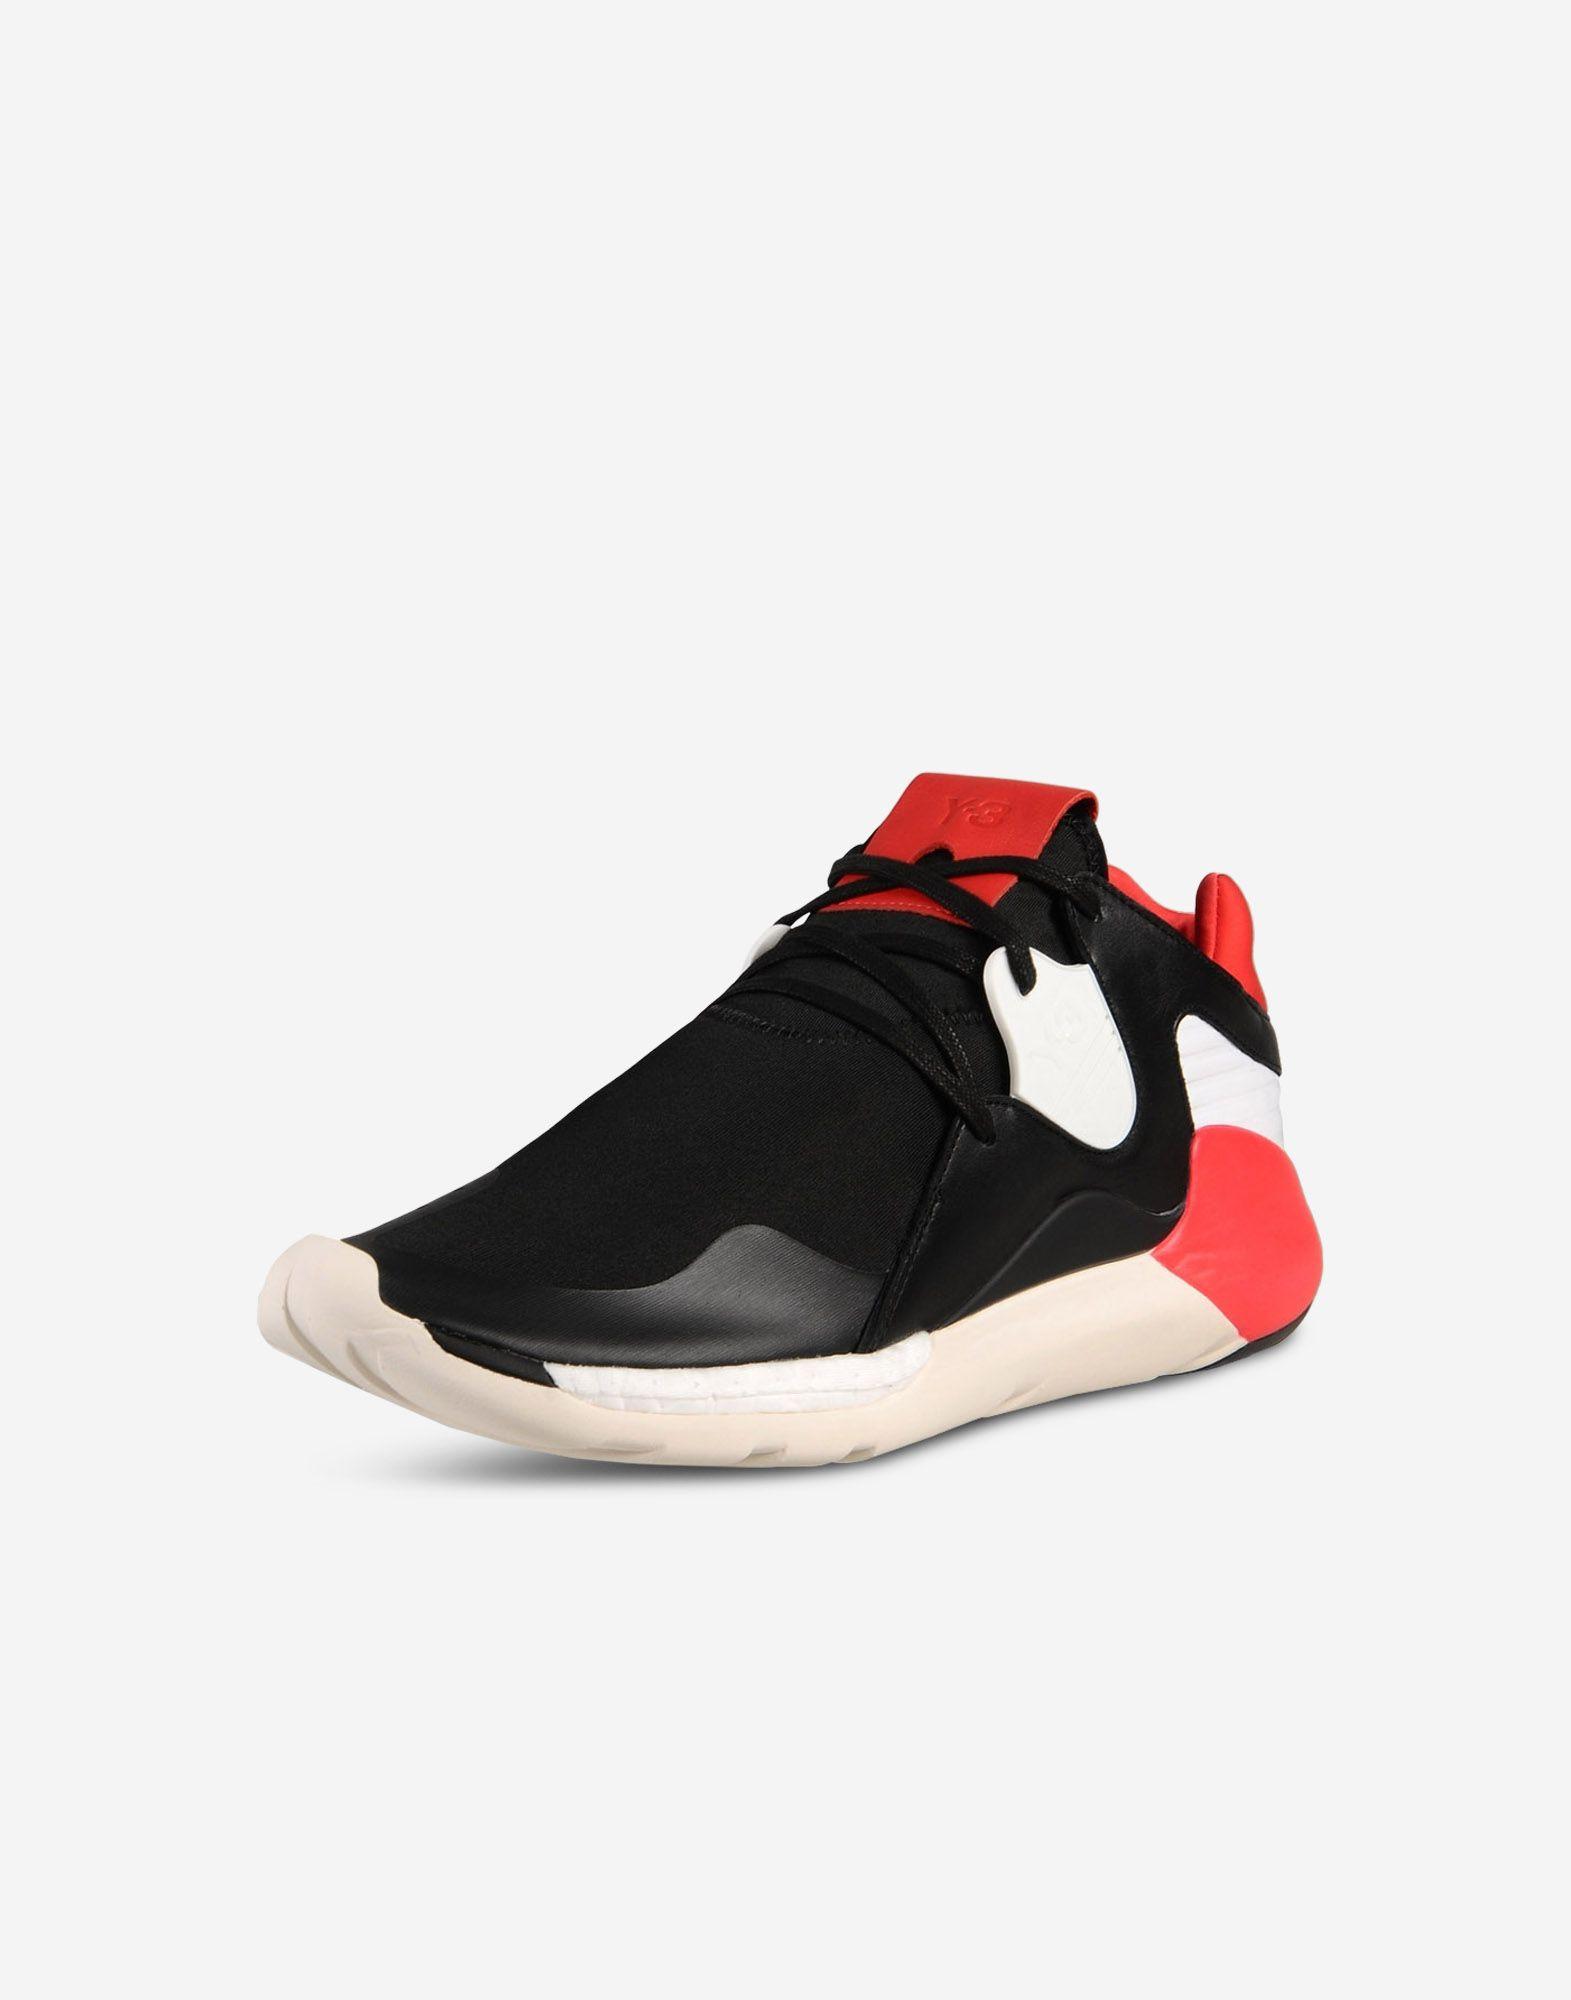 adidas y3 store online